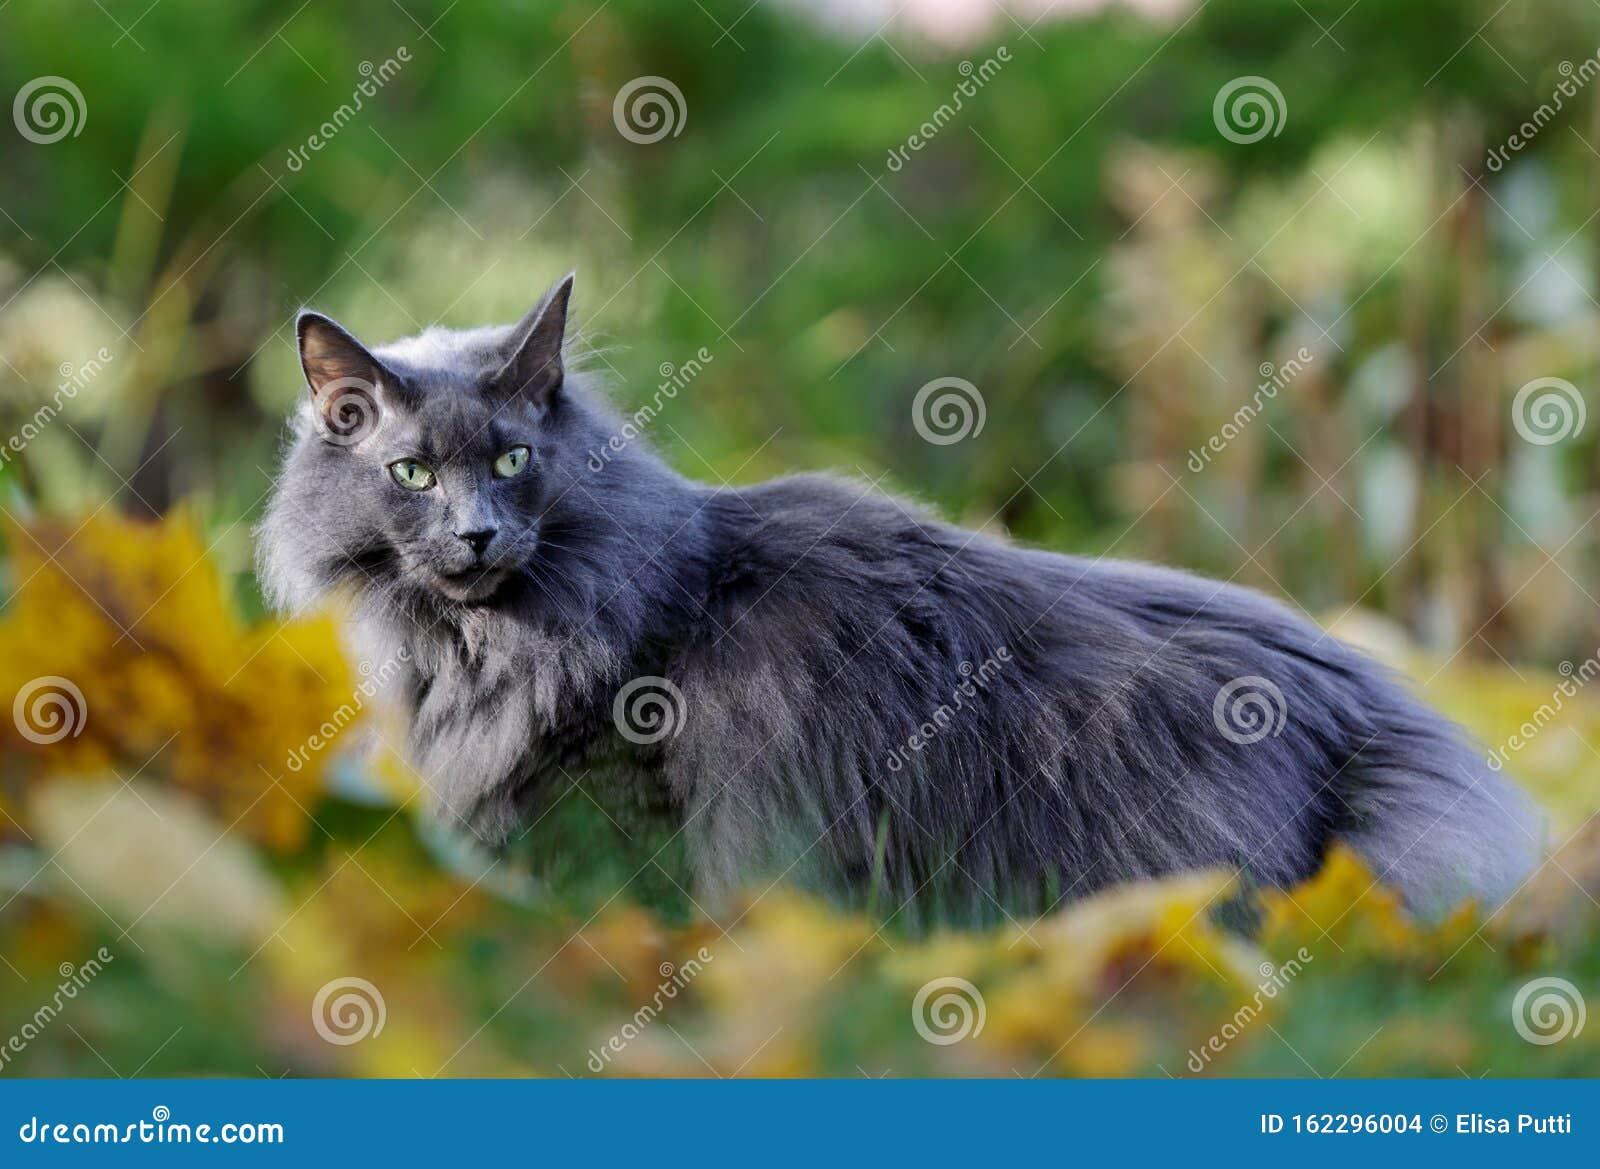 Blue Norwegian Forest Cat Female In Garden In Autumn Stock Photo Image Of Alertness Kitty 162296004